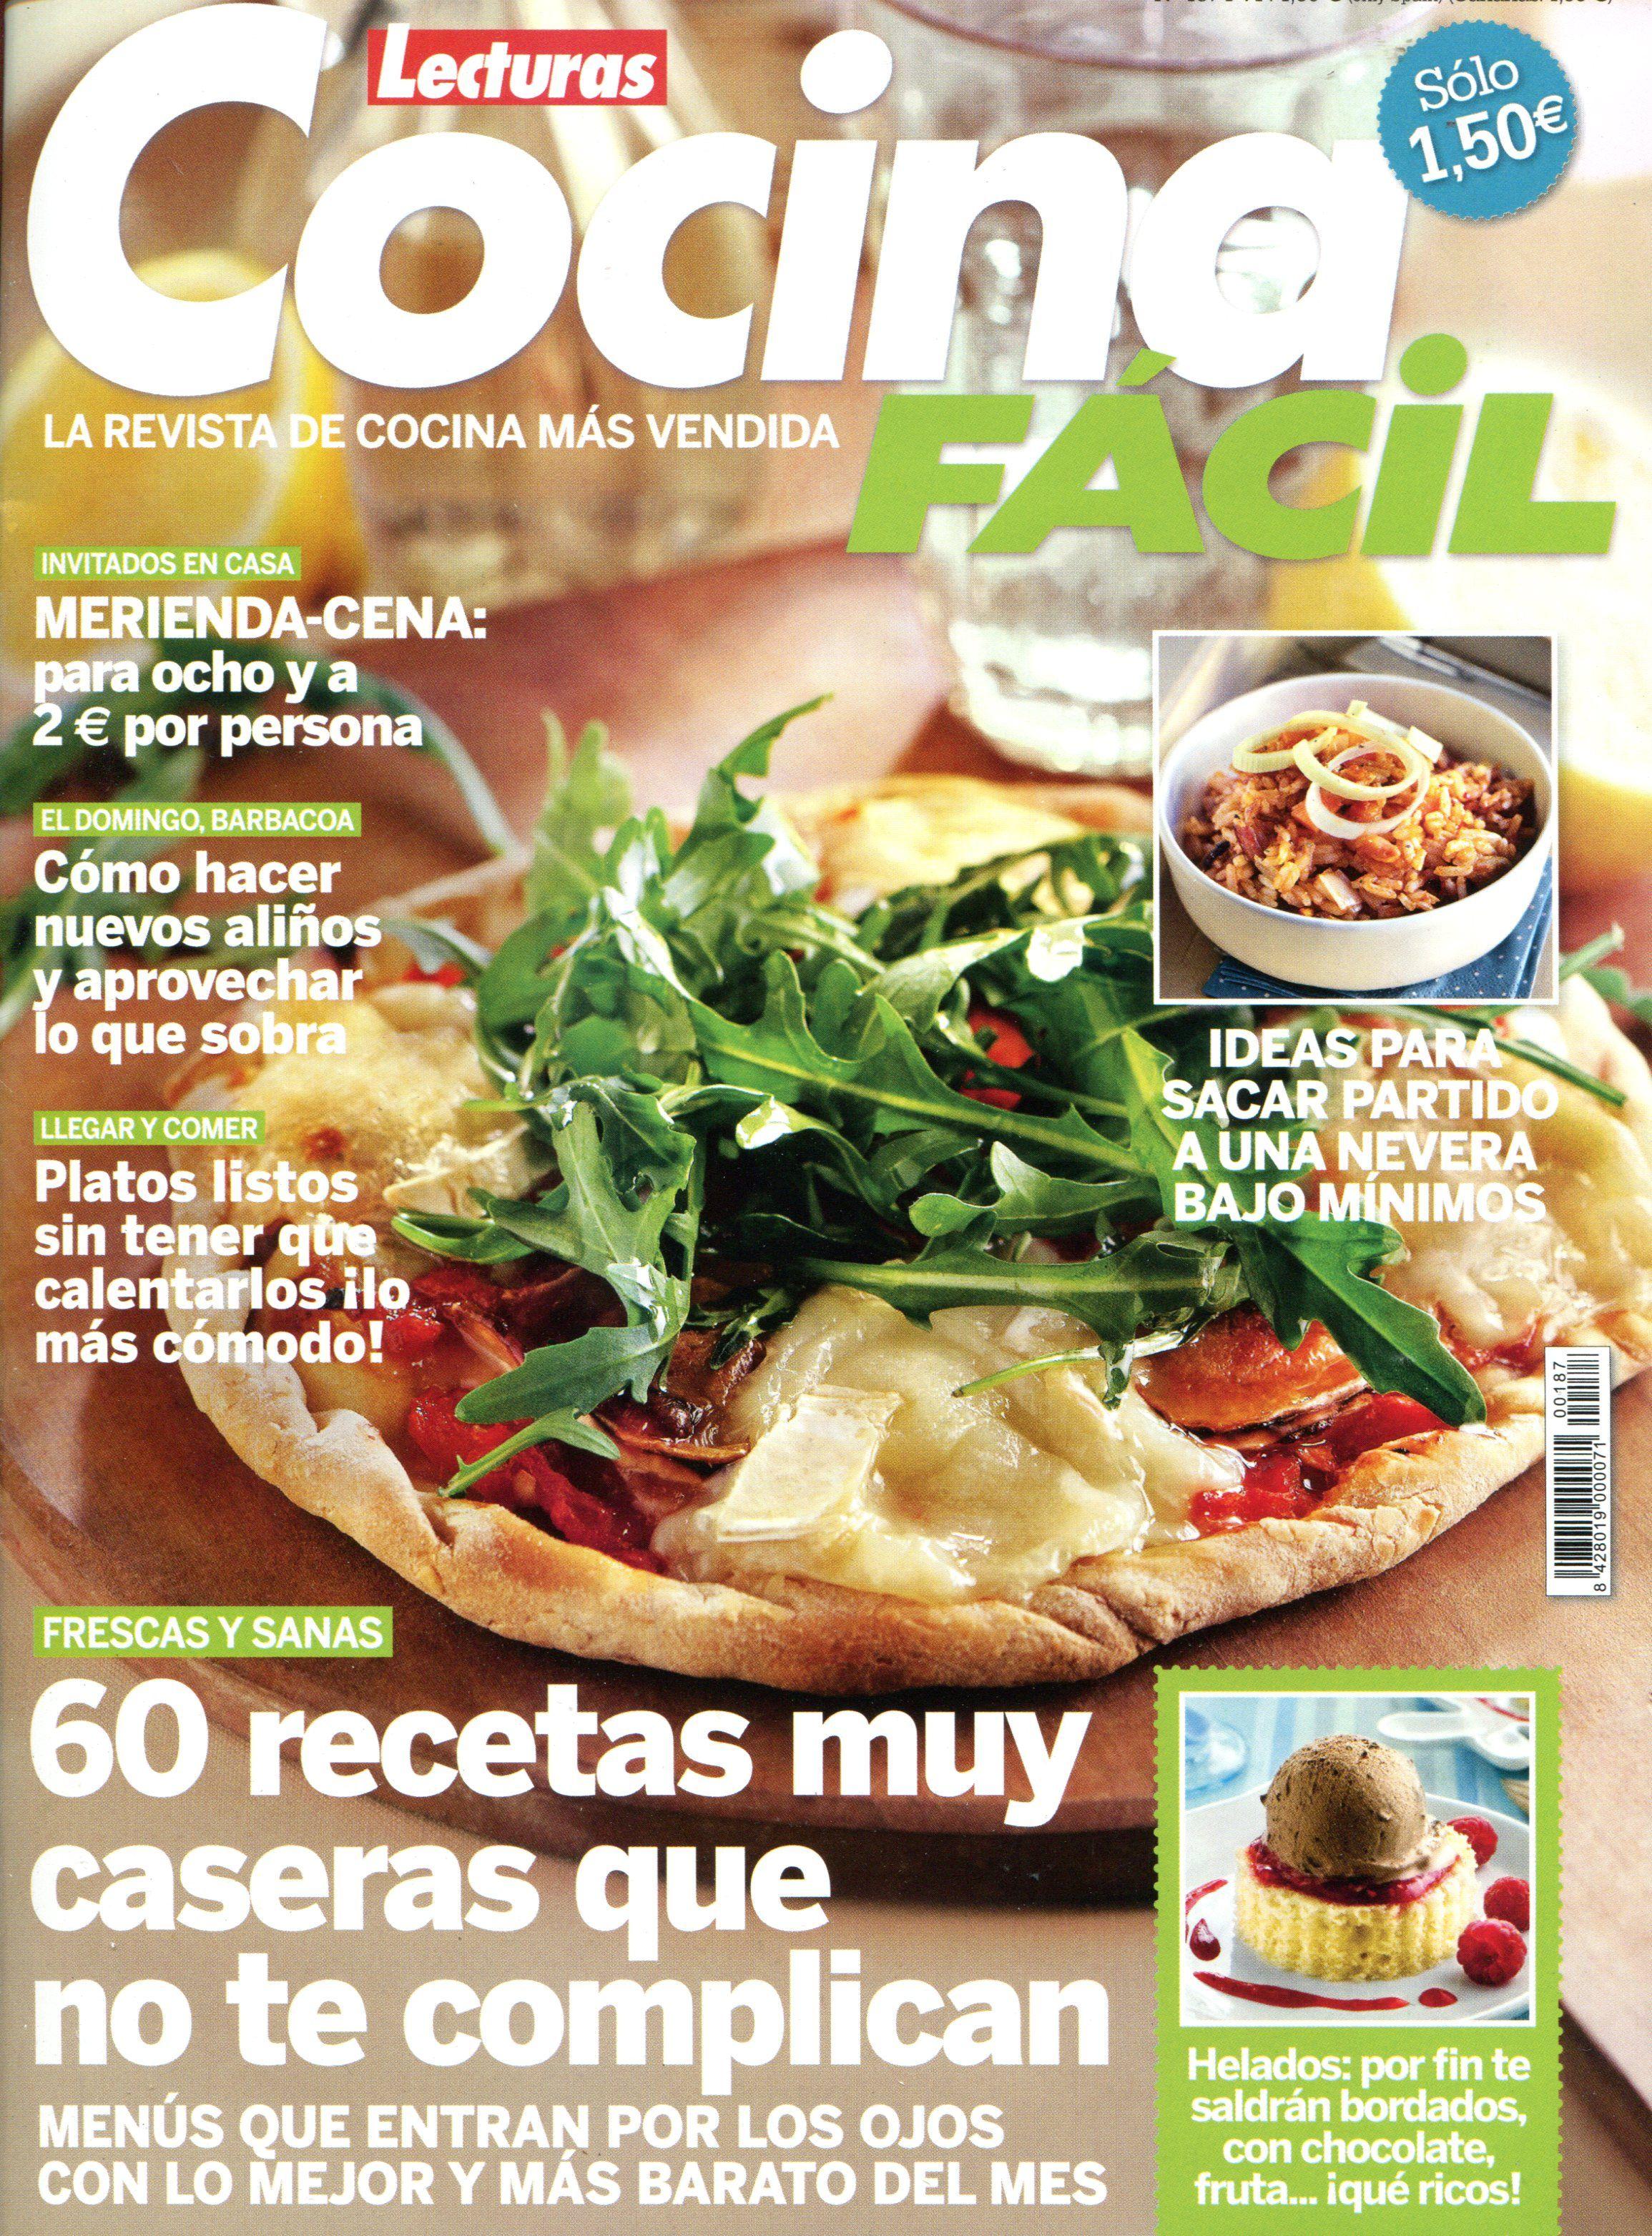 9584d29deab04e210542f1728a2975c8 - Cocina Y Recetas